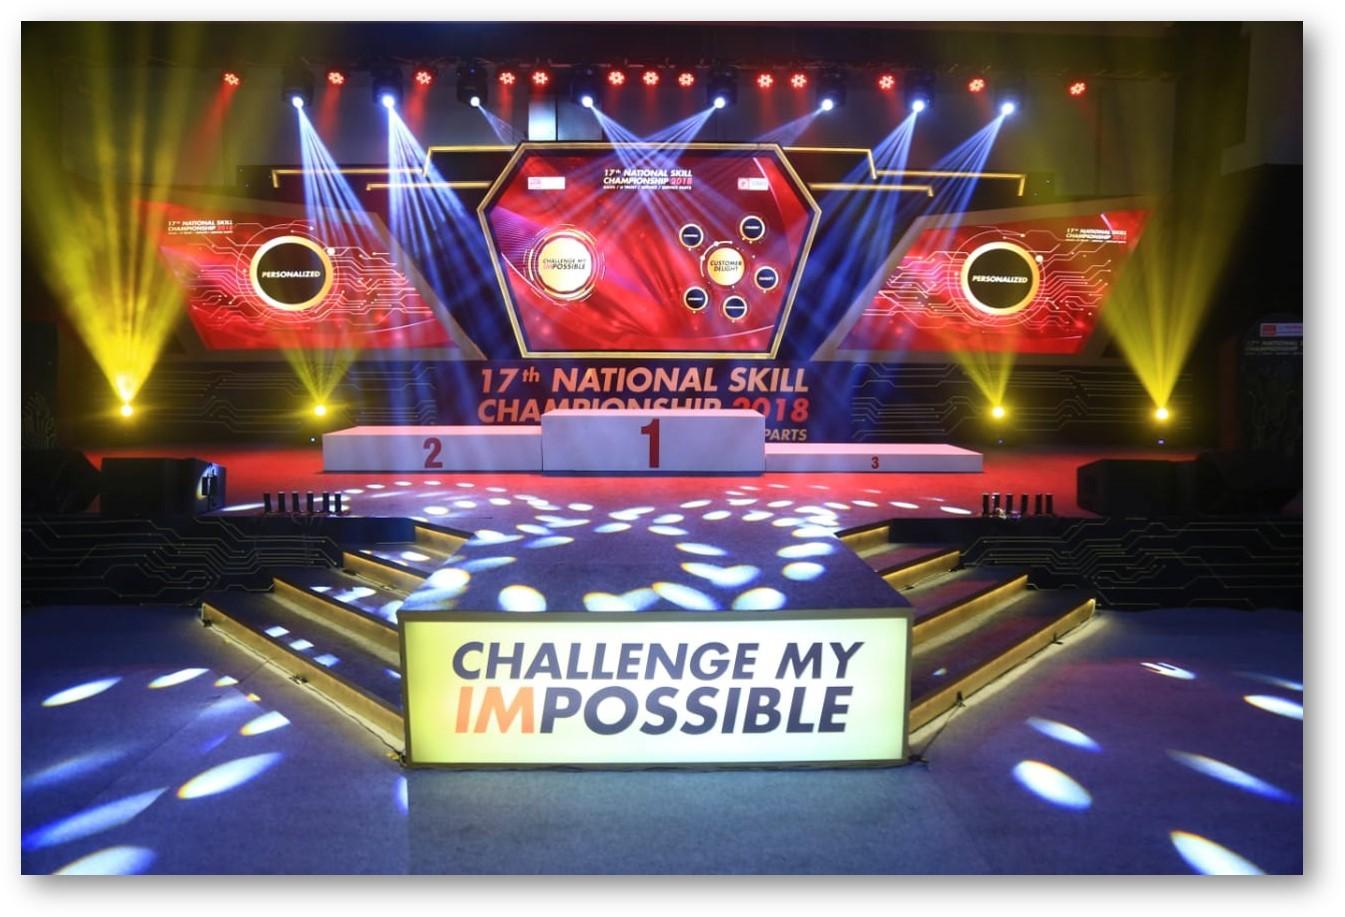 Maze events & Exhibit Solutions Pvt Ltd